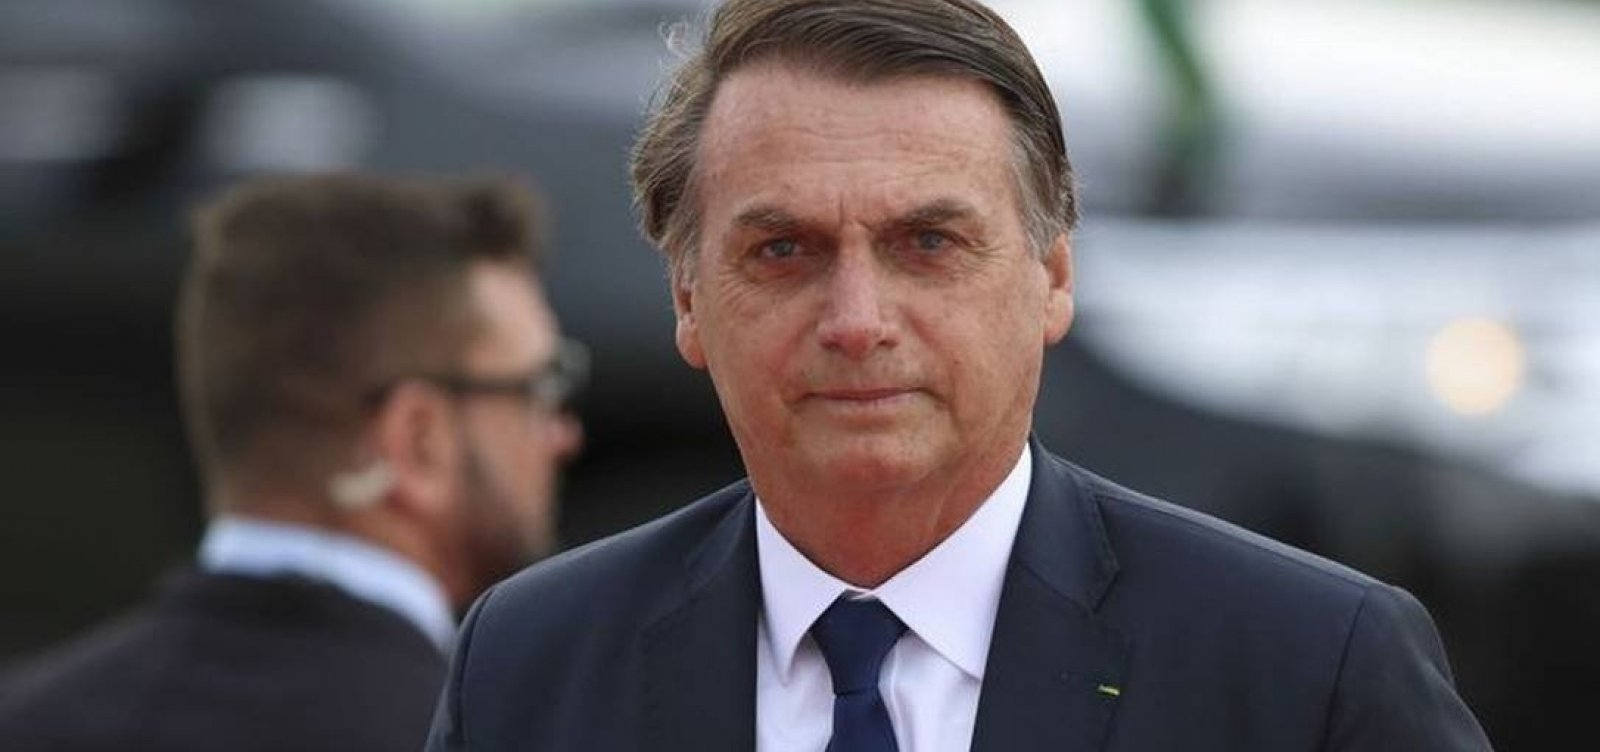 [Onyx anuncia que Bolsonaro vai revogar atual decreto das armas]